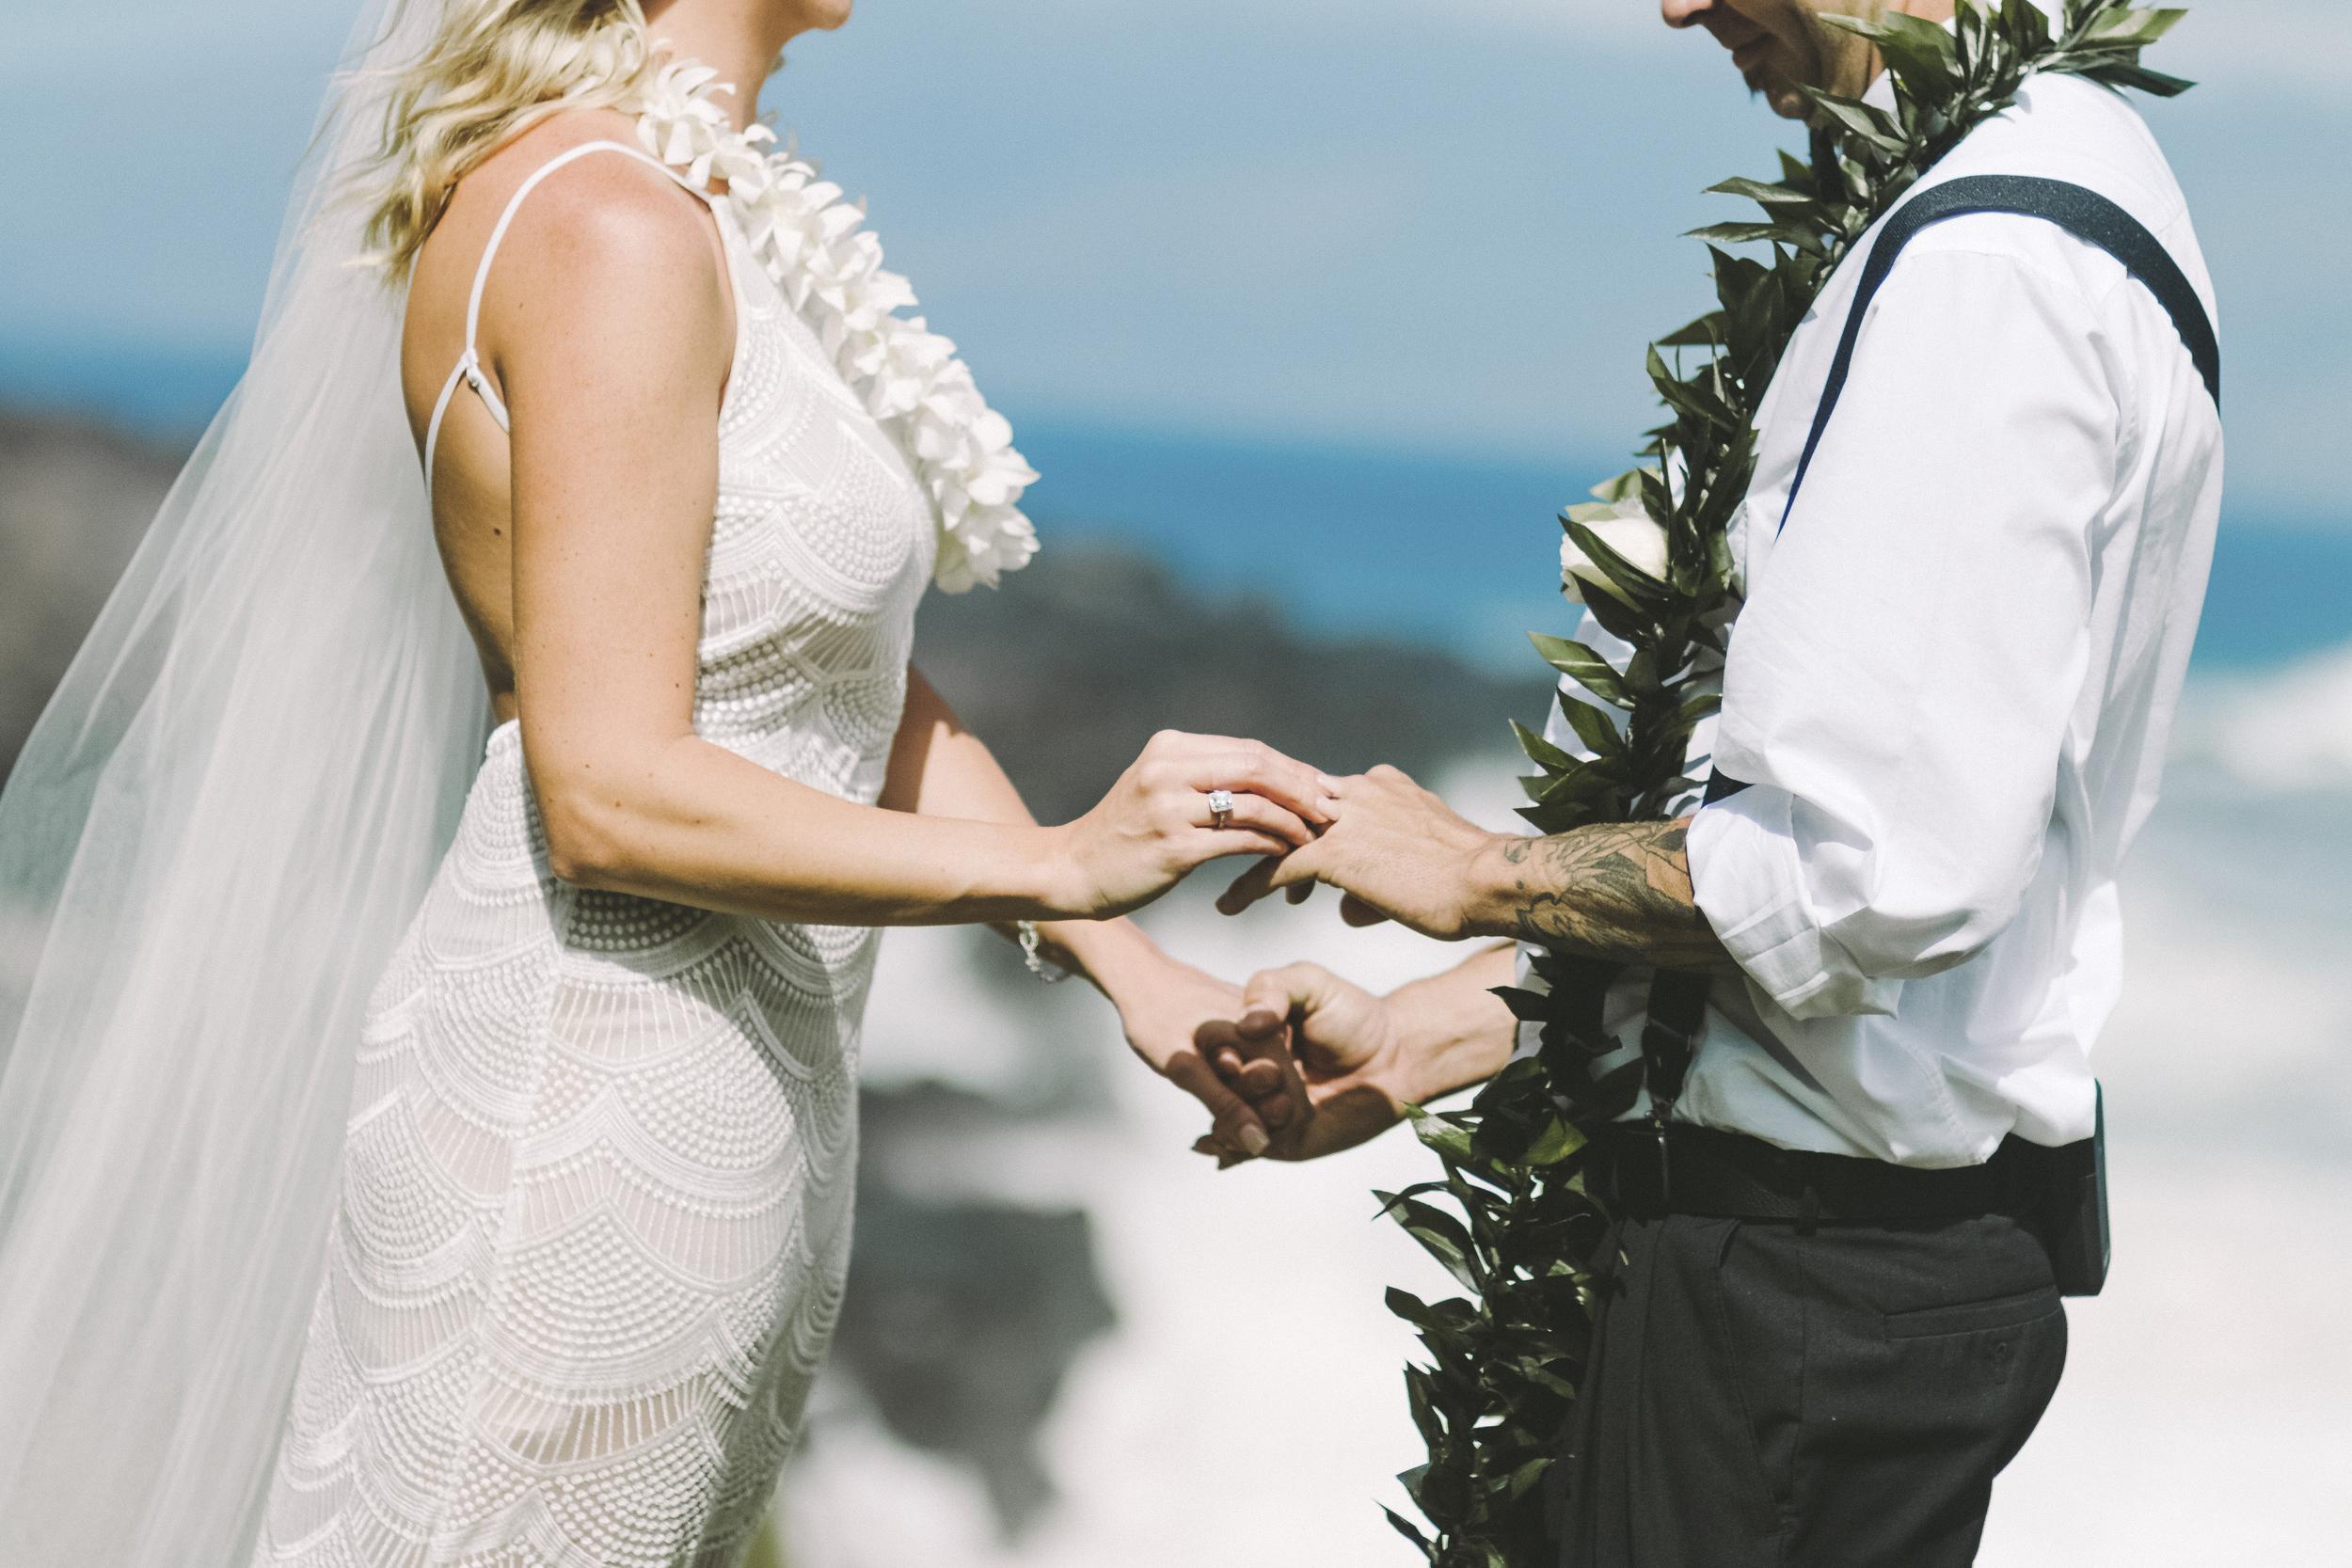 angie-diaz-photography-hawaii-wedding-17.jpg